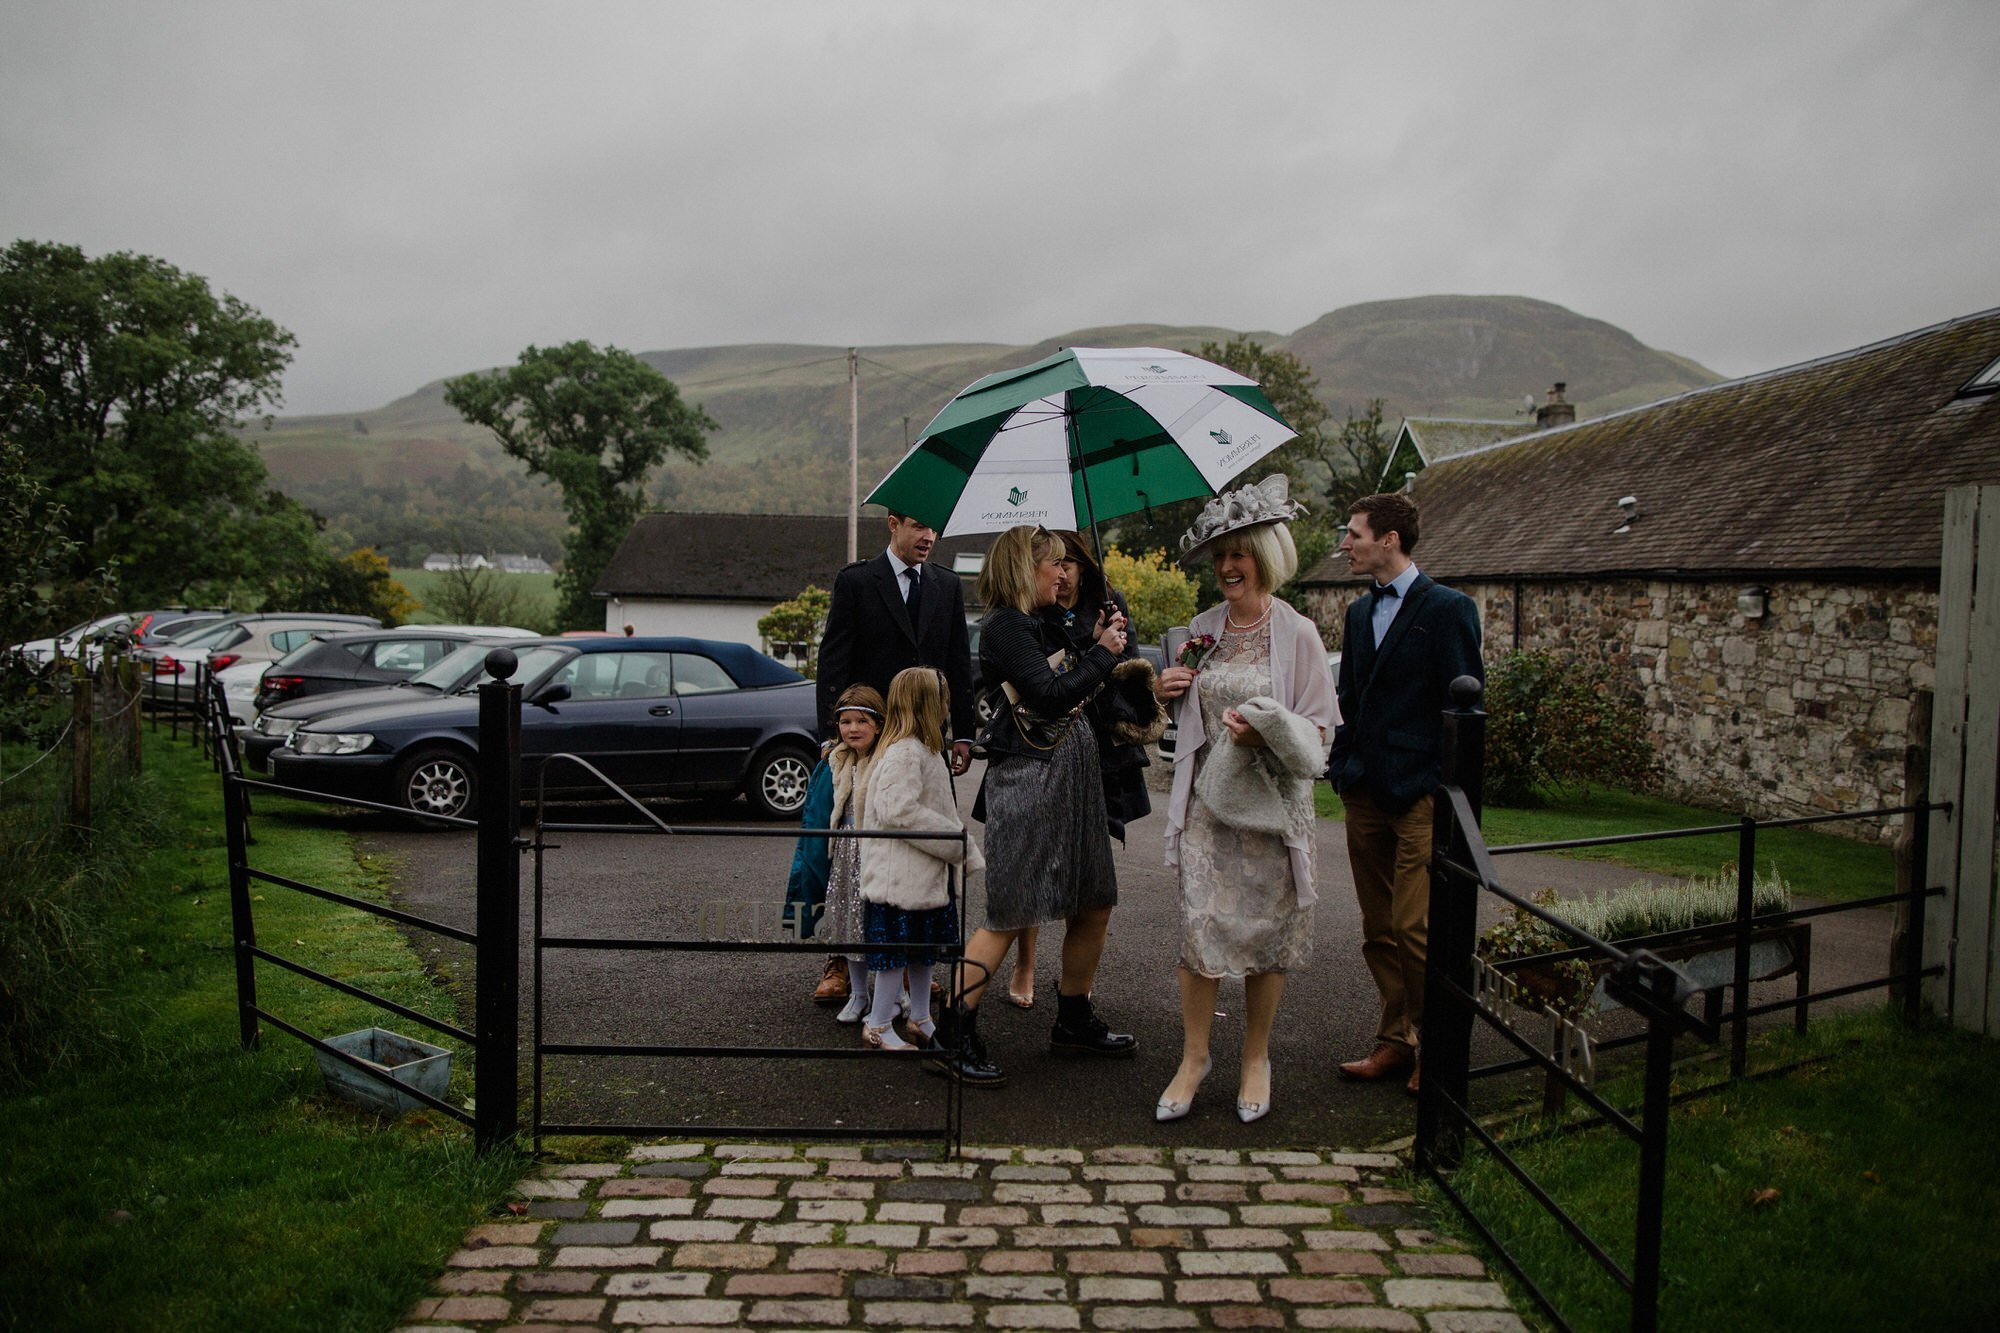 012 TIN SHED KNOCKRAICH FARM WEDDING ALTERNATIVE BRIDE ZOE ALEXANDRA PHOTOGRAPHY